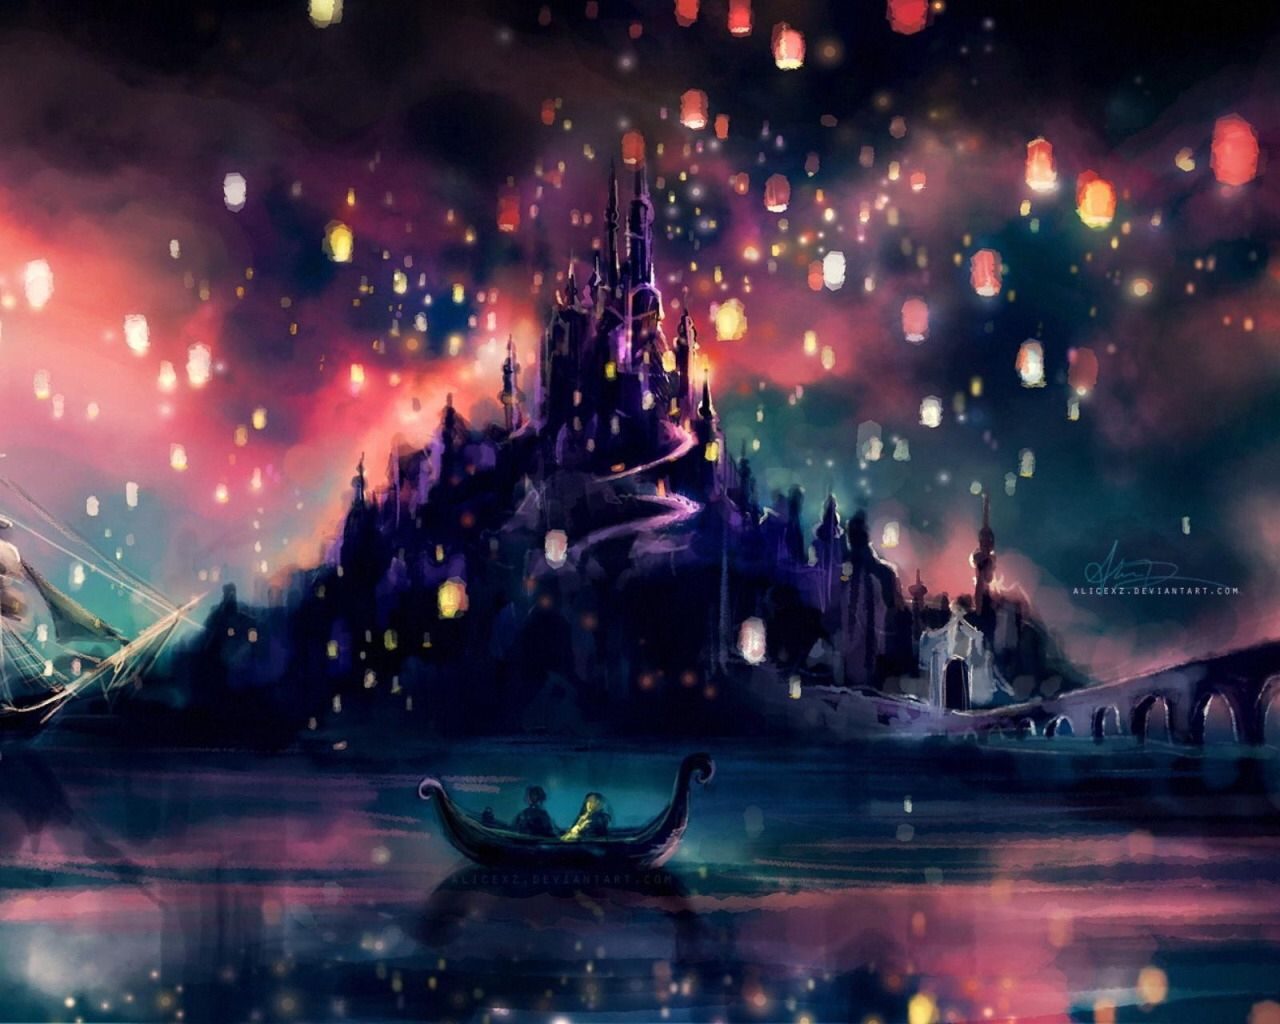 Amazing Wallpaper Harry Potter Apple - f3e25456fa93c23517431d2a69be6279  Graphic_502093.jpg